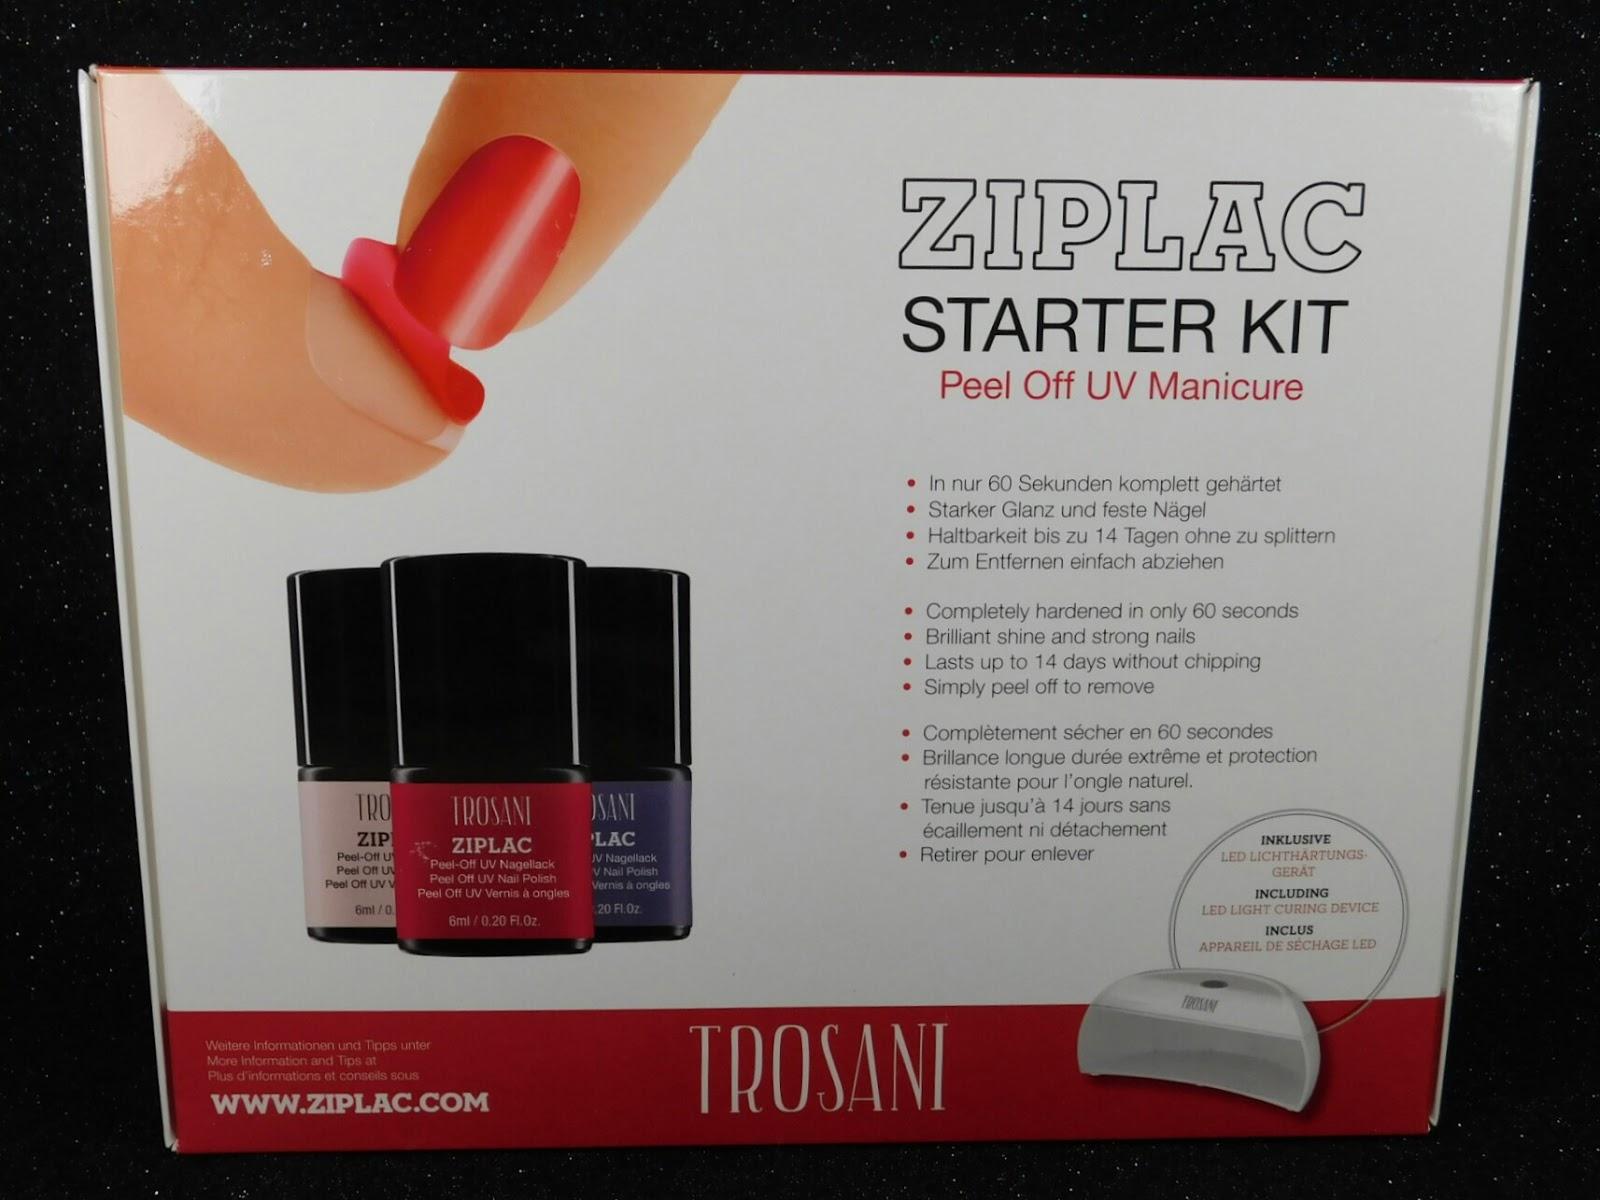 B Nailed To Perfection: Trosani UK product review - Polish and gel kit